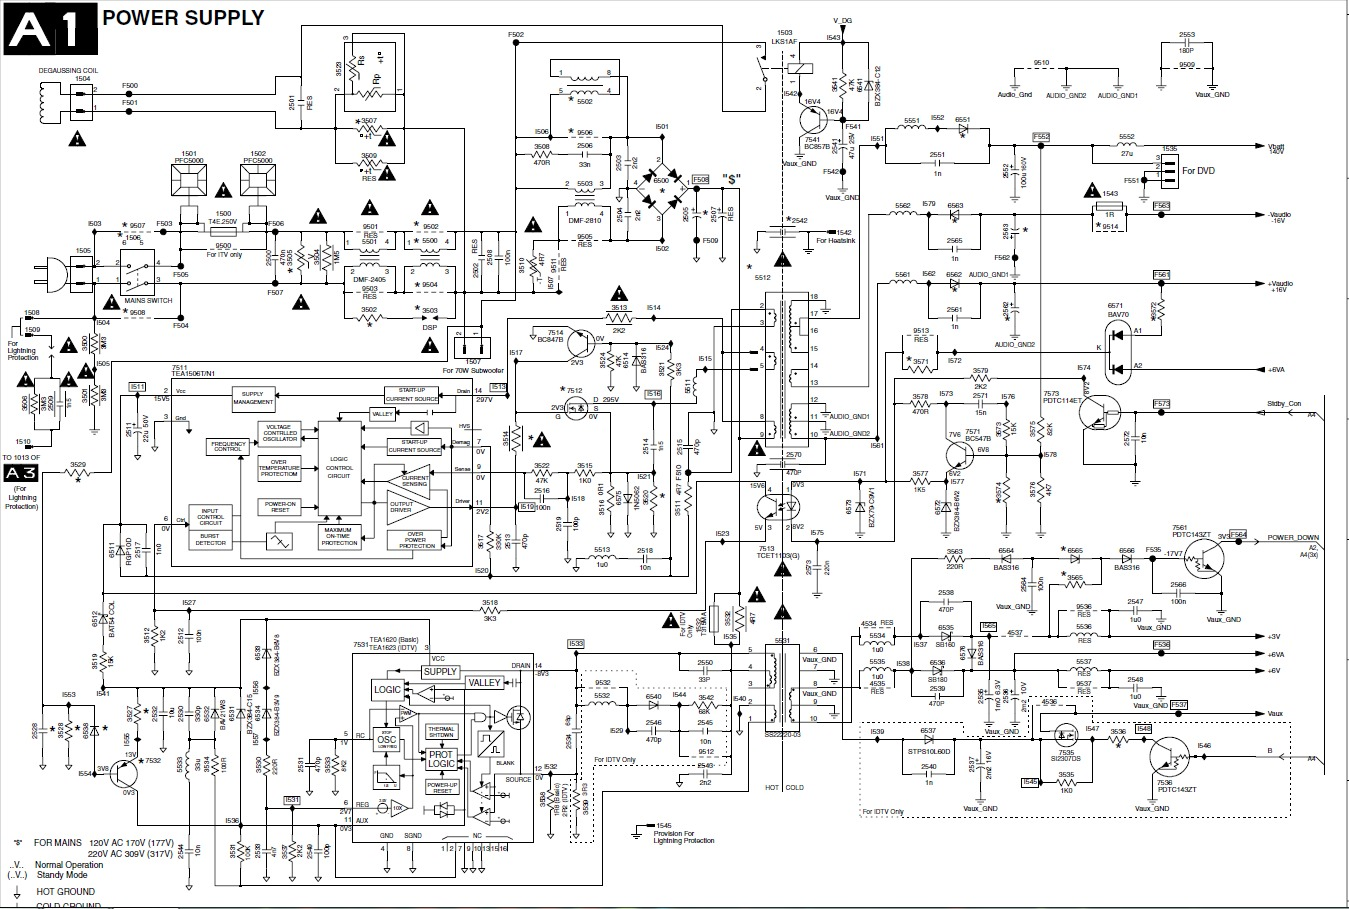 Philips Power Supply 29pt6447 Png Diagramas De Televisores